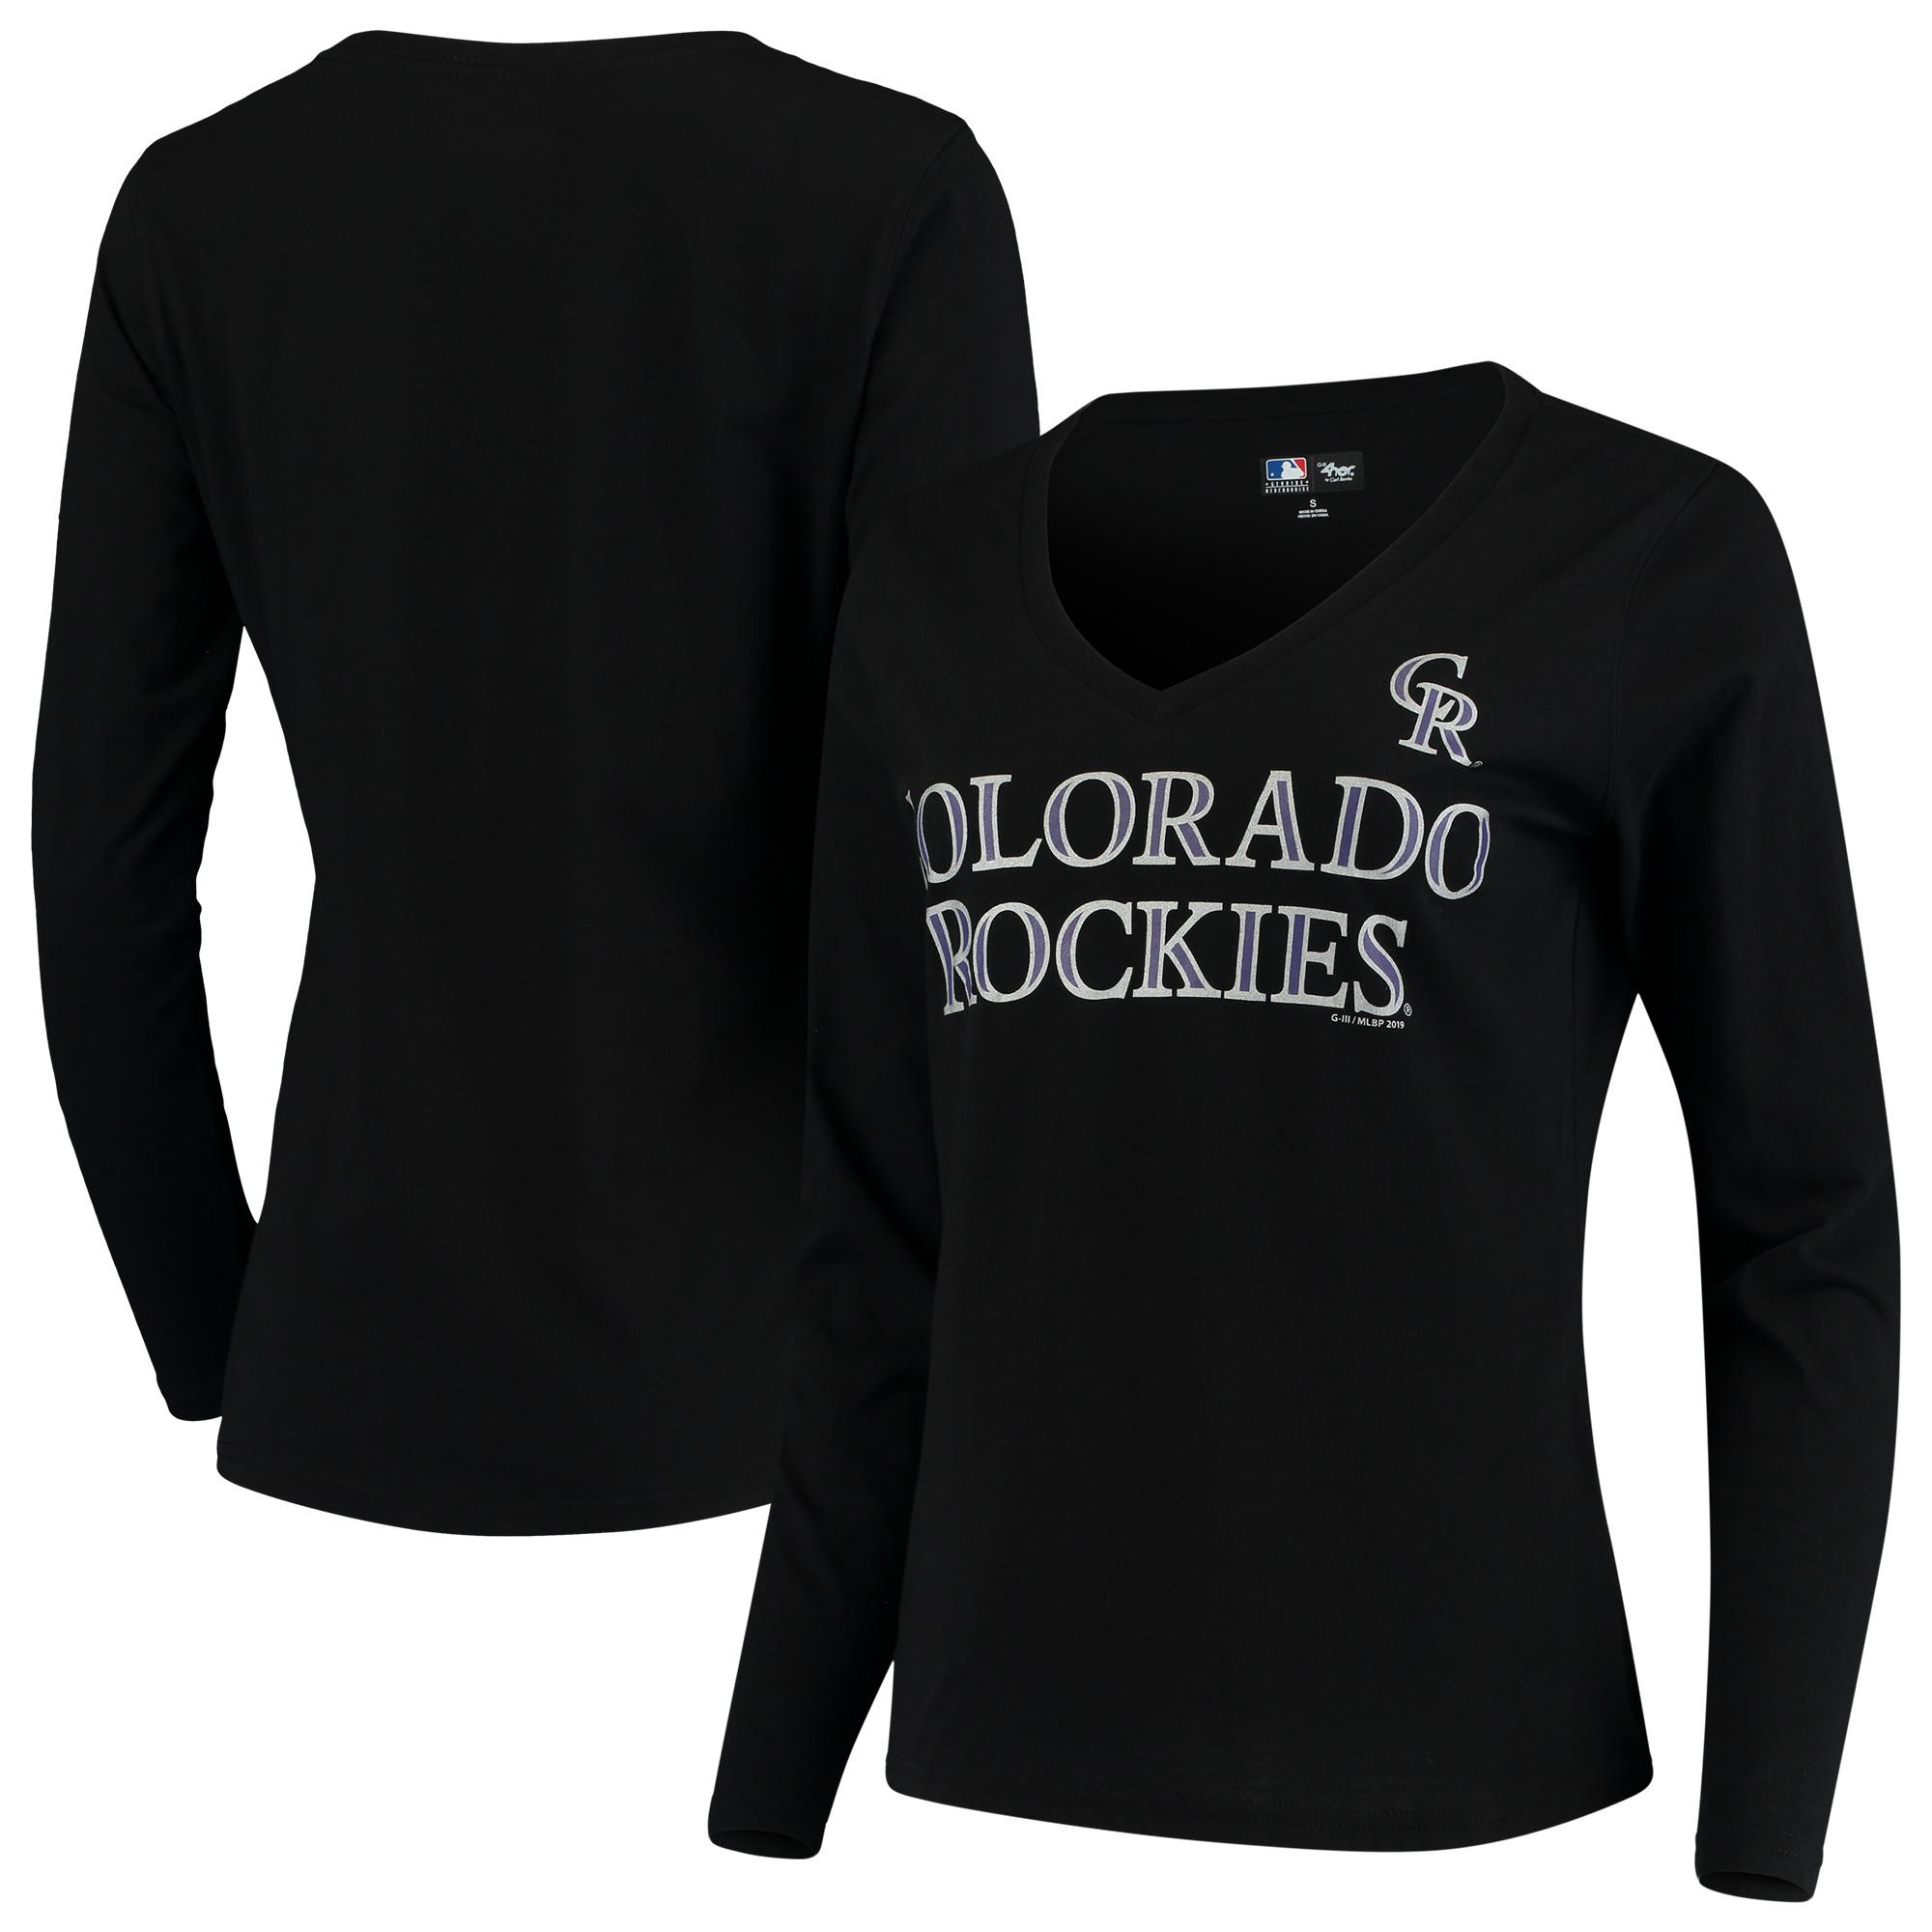 Colorado Rockies G-III 4Her by Carl Banks Women's Post Season Long Sleeve T-Shirt - Black